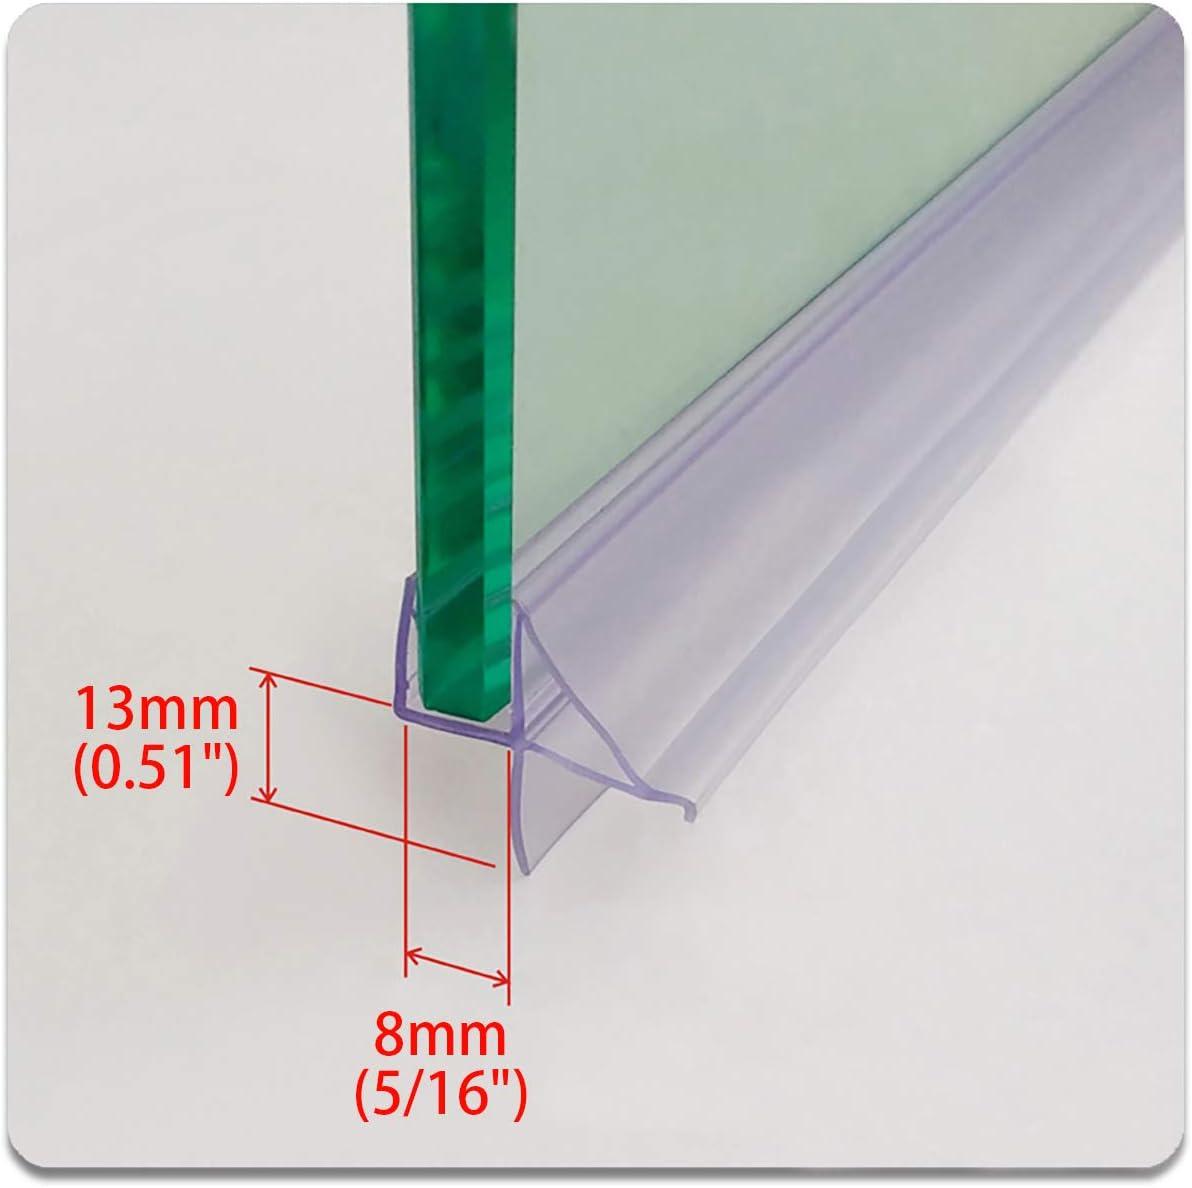 "Cozylkx Frameless Glass Door Bottom Gap Seal, 5/16 Inch Glass, 0.51"" Gap, Shower Room Bathroom Pull-Push Door Sealing Sweep Stop Shower Leaking"